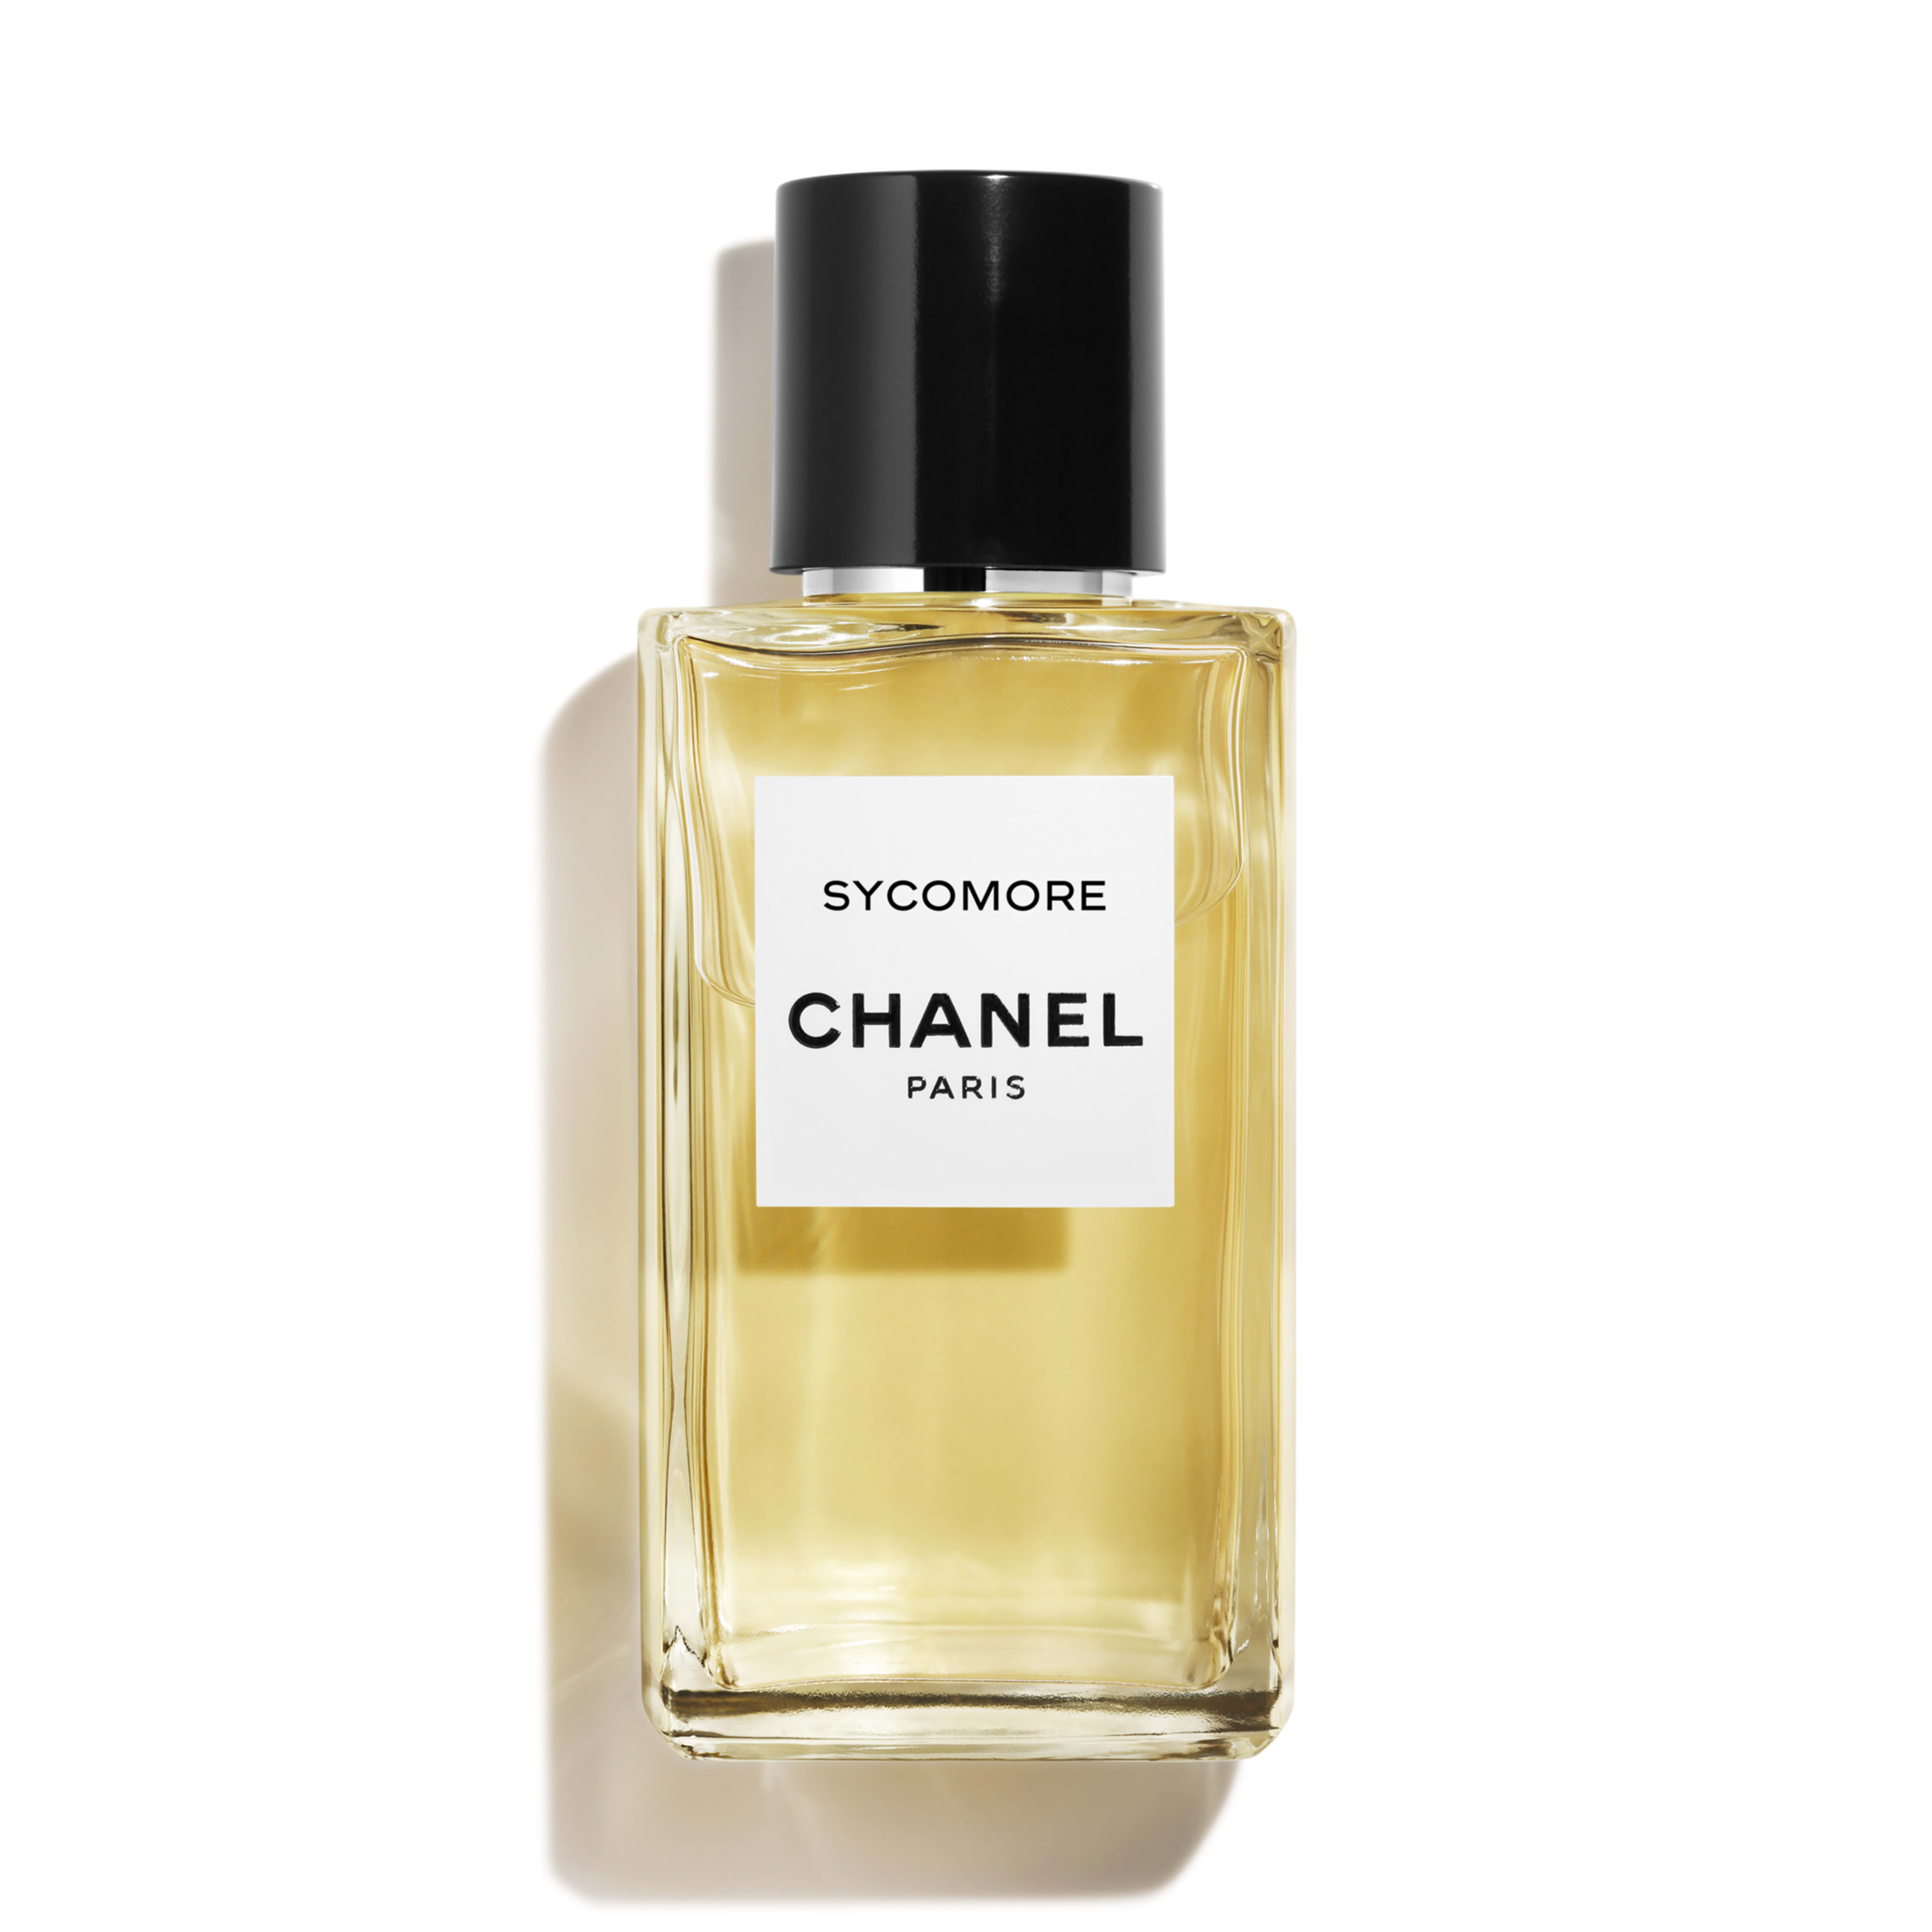 SYCOMORE - fragrance - 6.8FL. OZ. - Default view